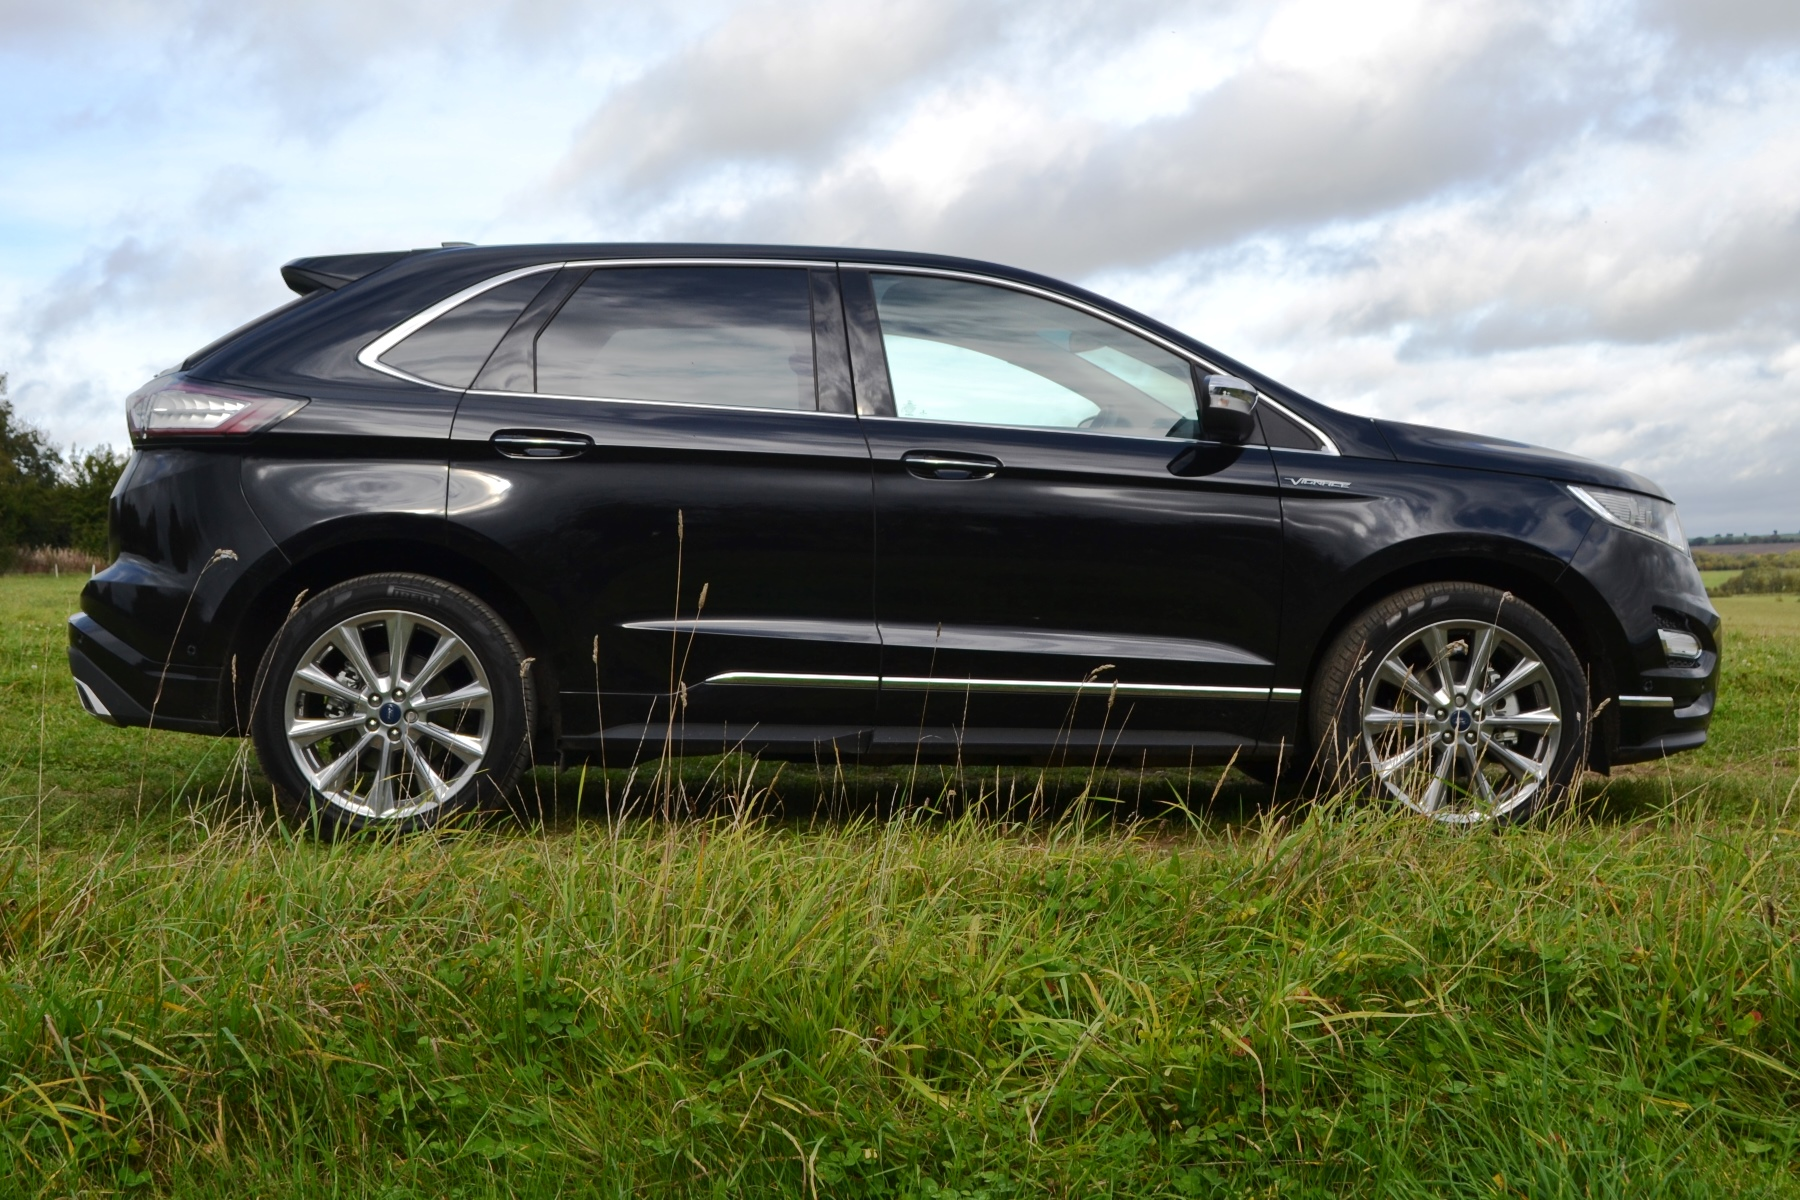 Audi q5 review uk dating 5